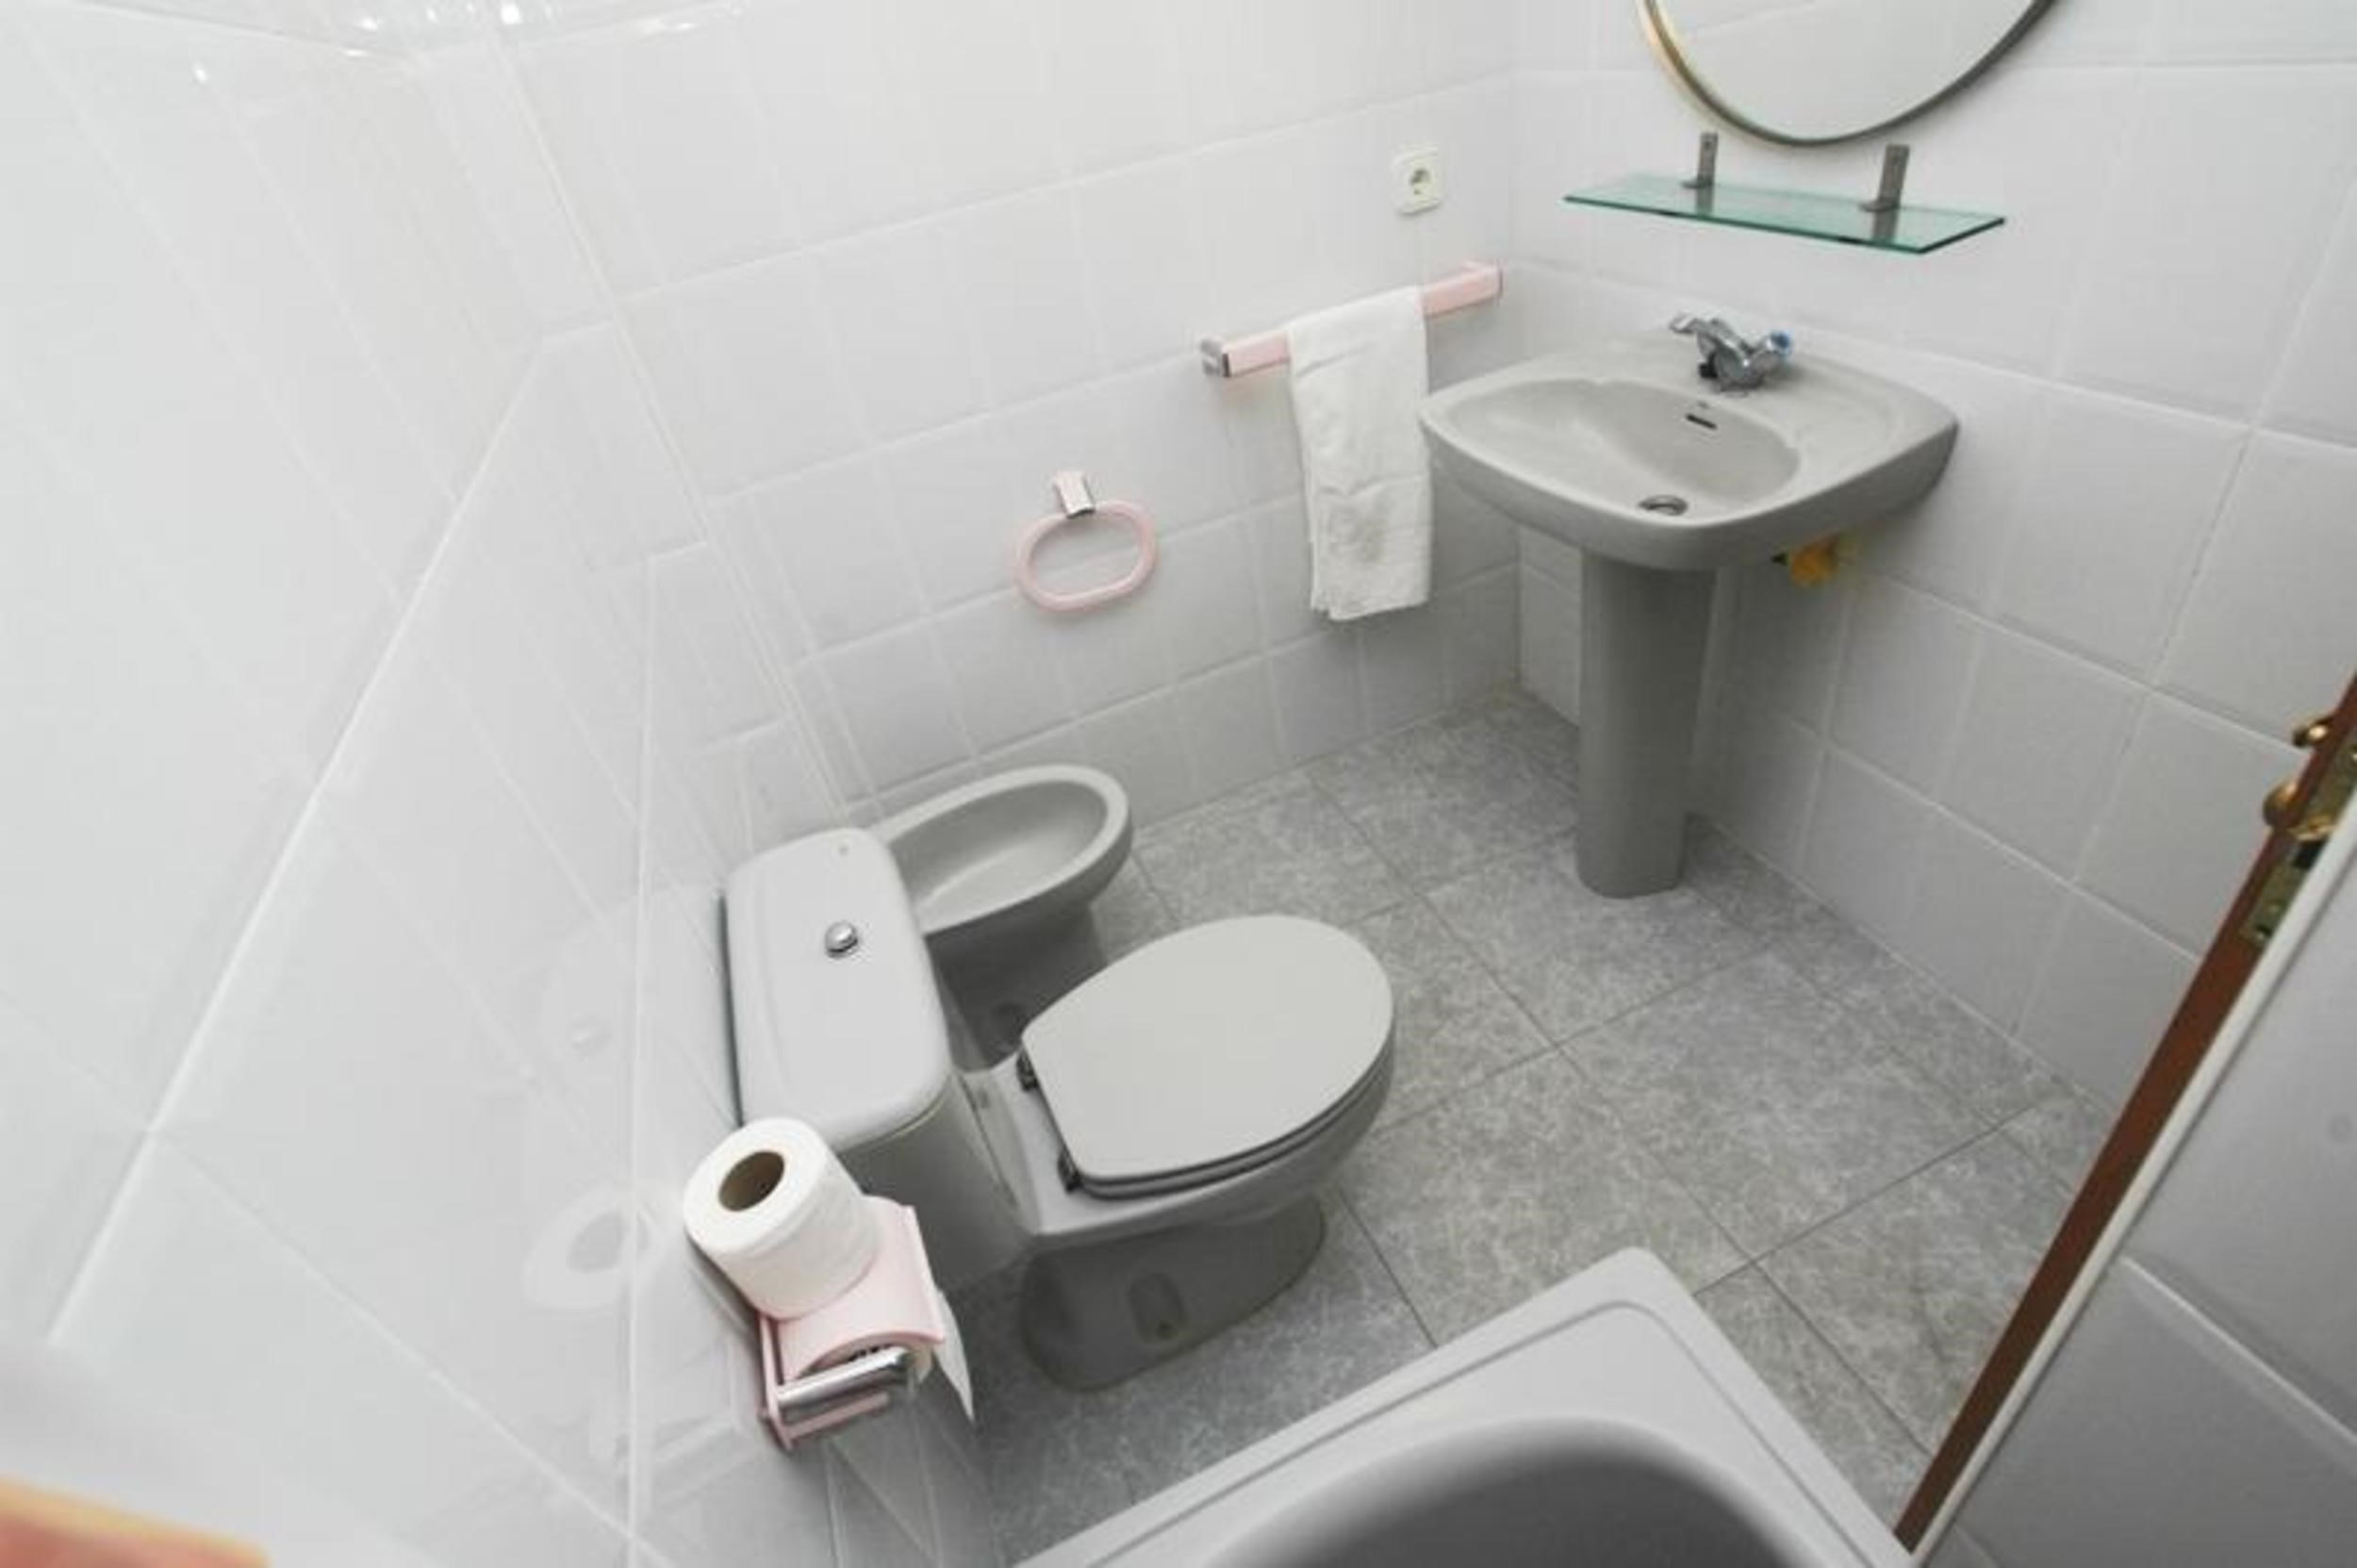 Ferienwohnung Apartment - 2 Bedrooms with Pool and Sea views - 102761 (2360861), Isla, Costa de Cantabria, Kantabrien, Spanien, Bild 10